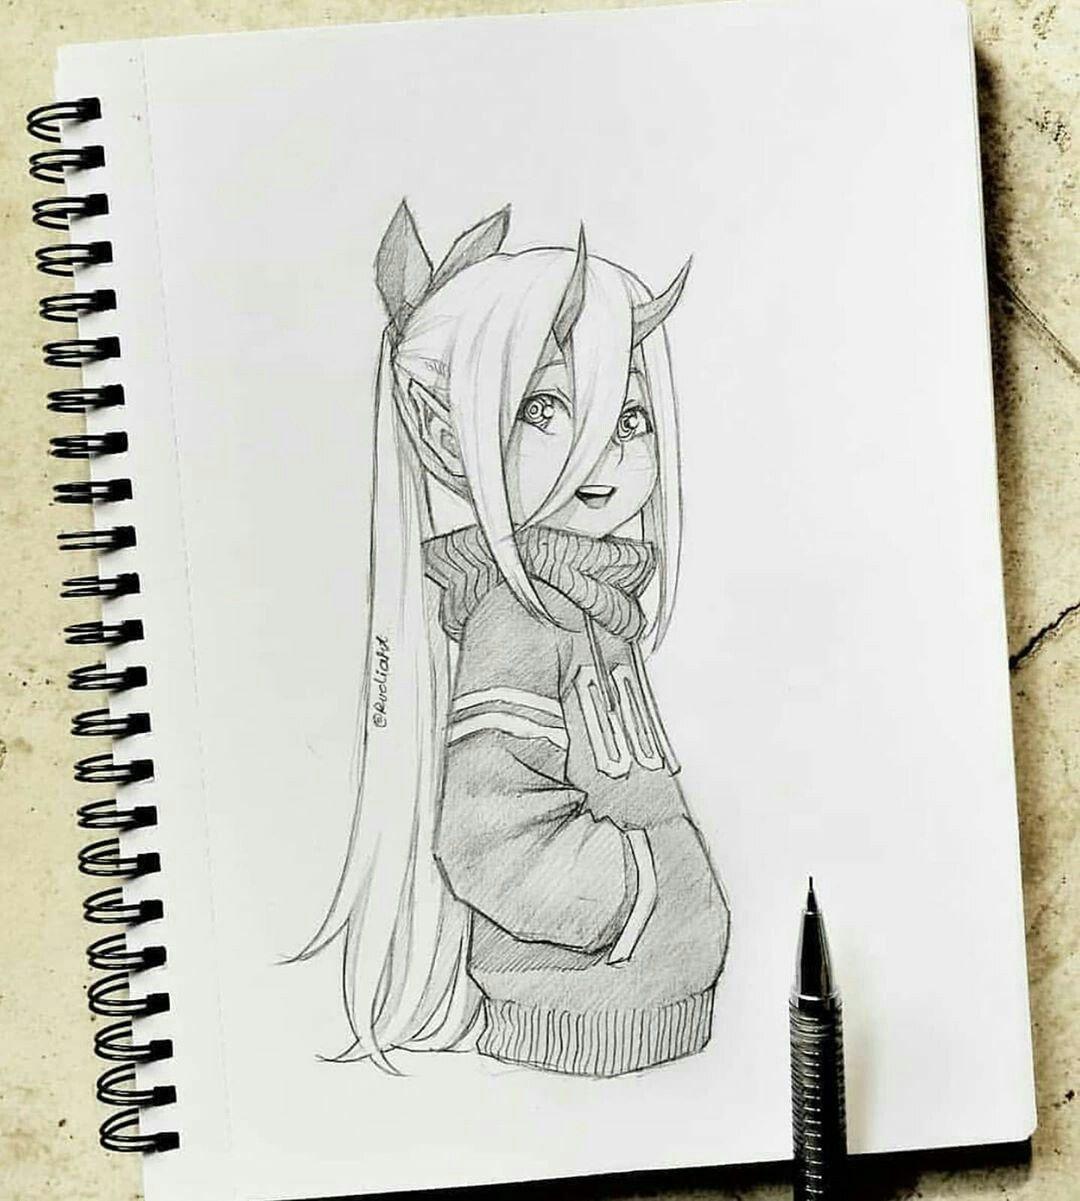 Pin De Sydney Em Desenhos Menina Anime Anime Desenhos Aleatorios